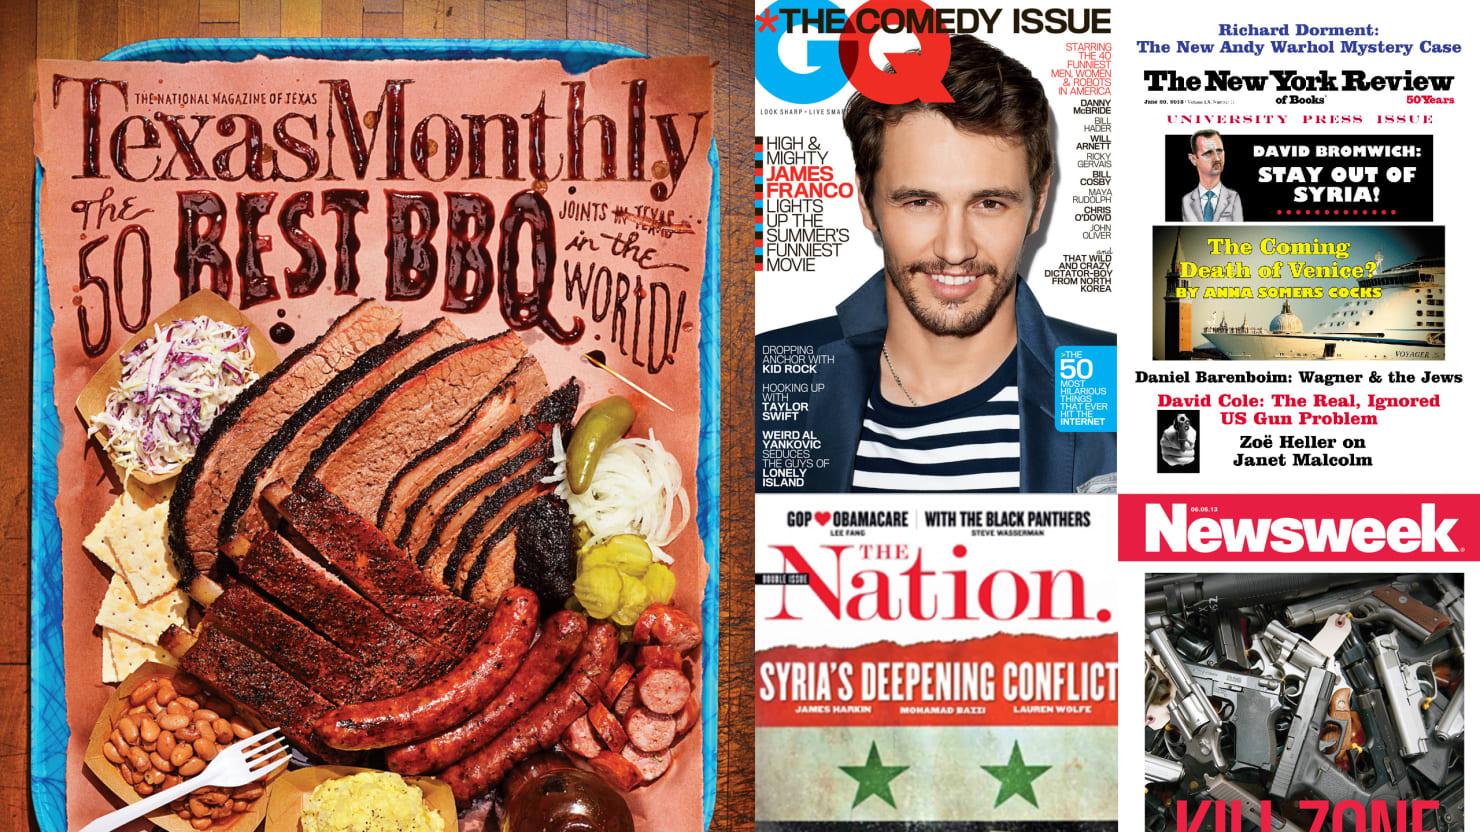 The Week's Best Longreads for June 7, 2013